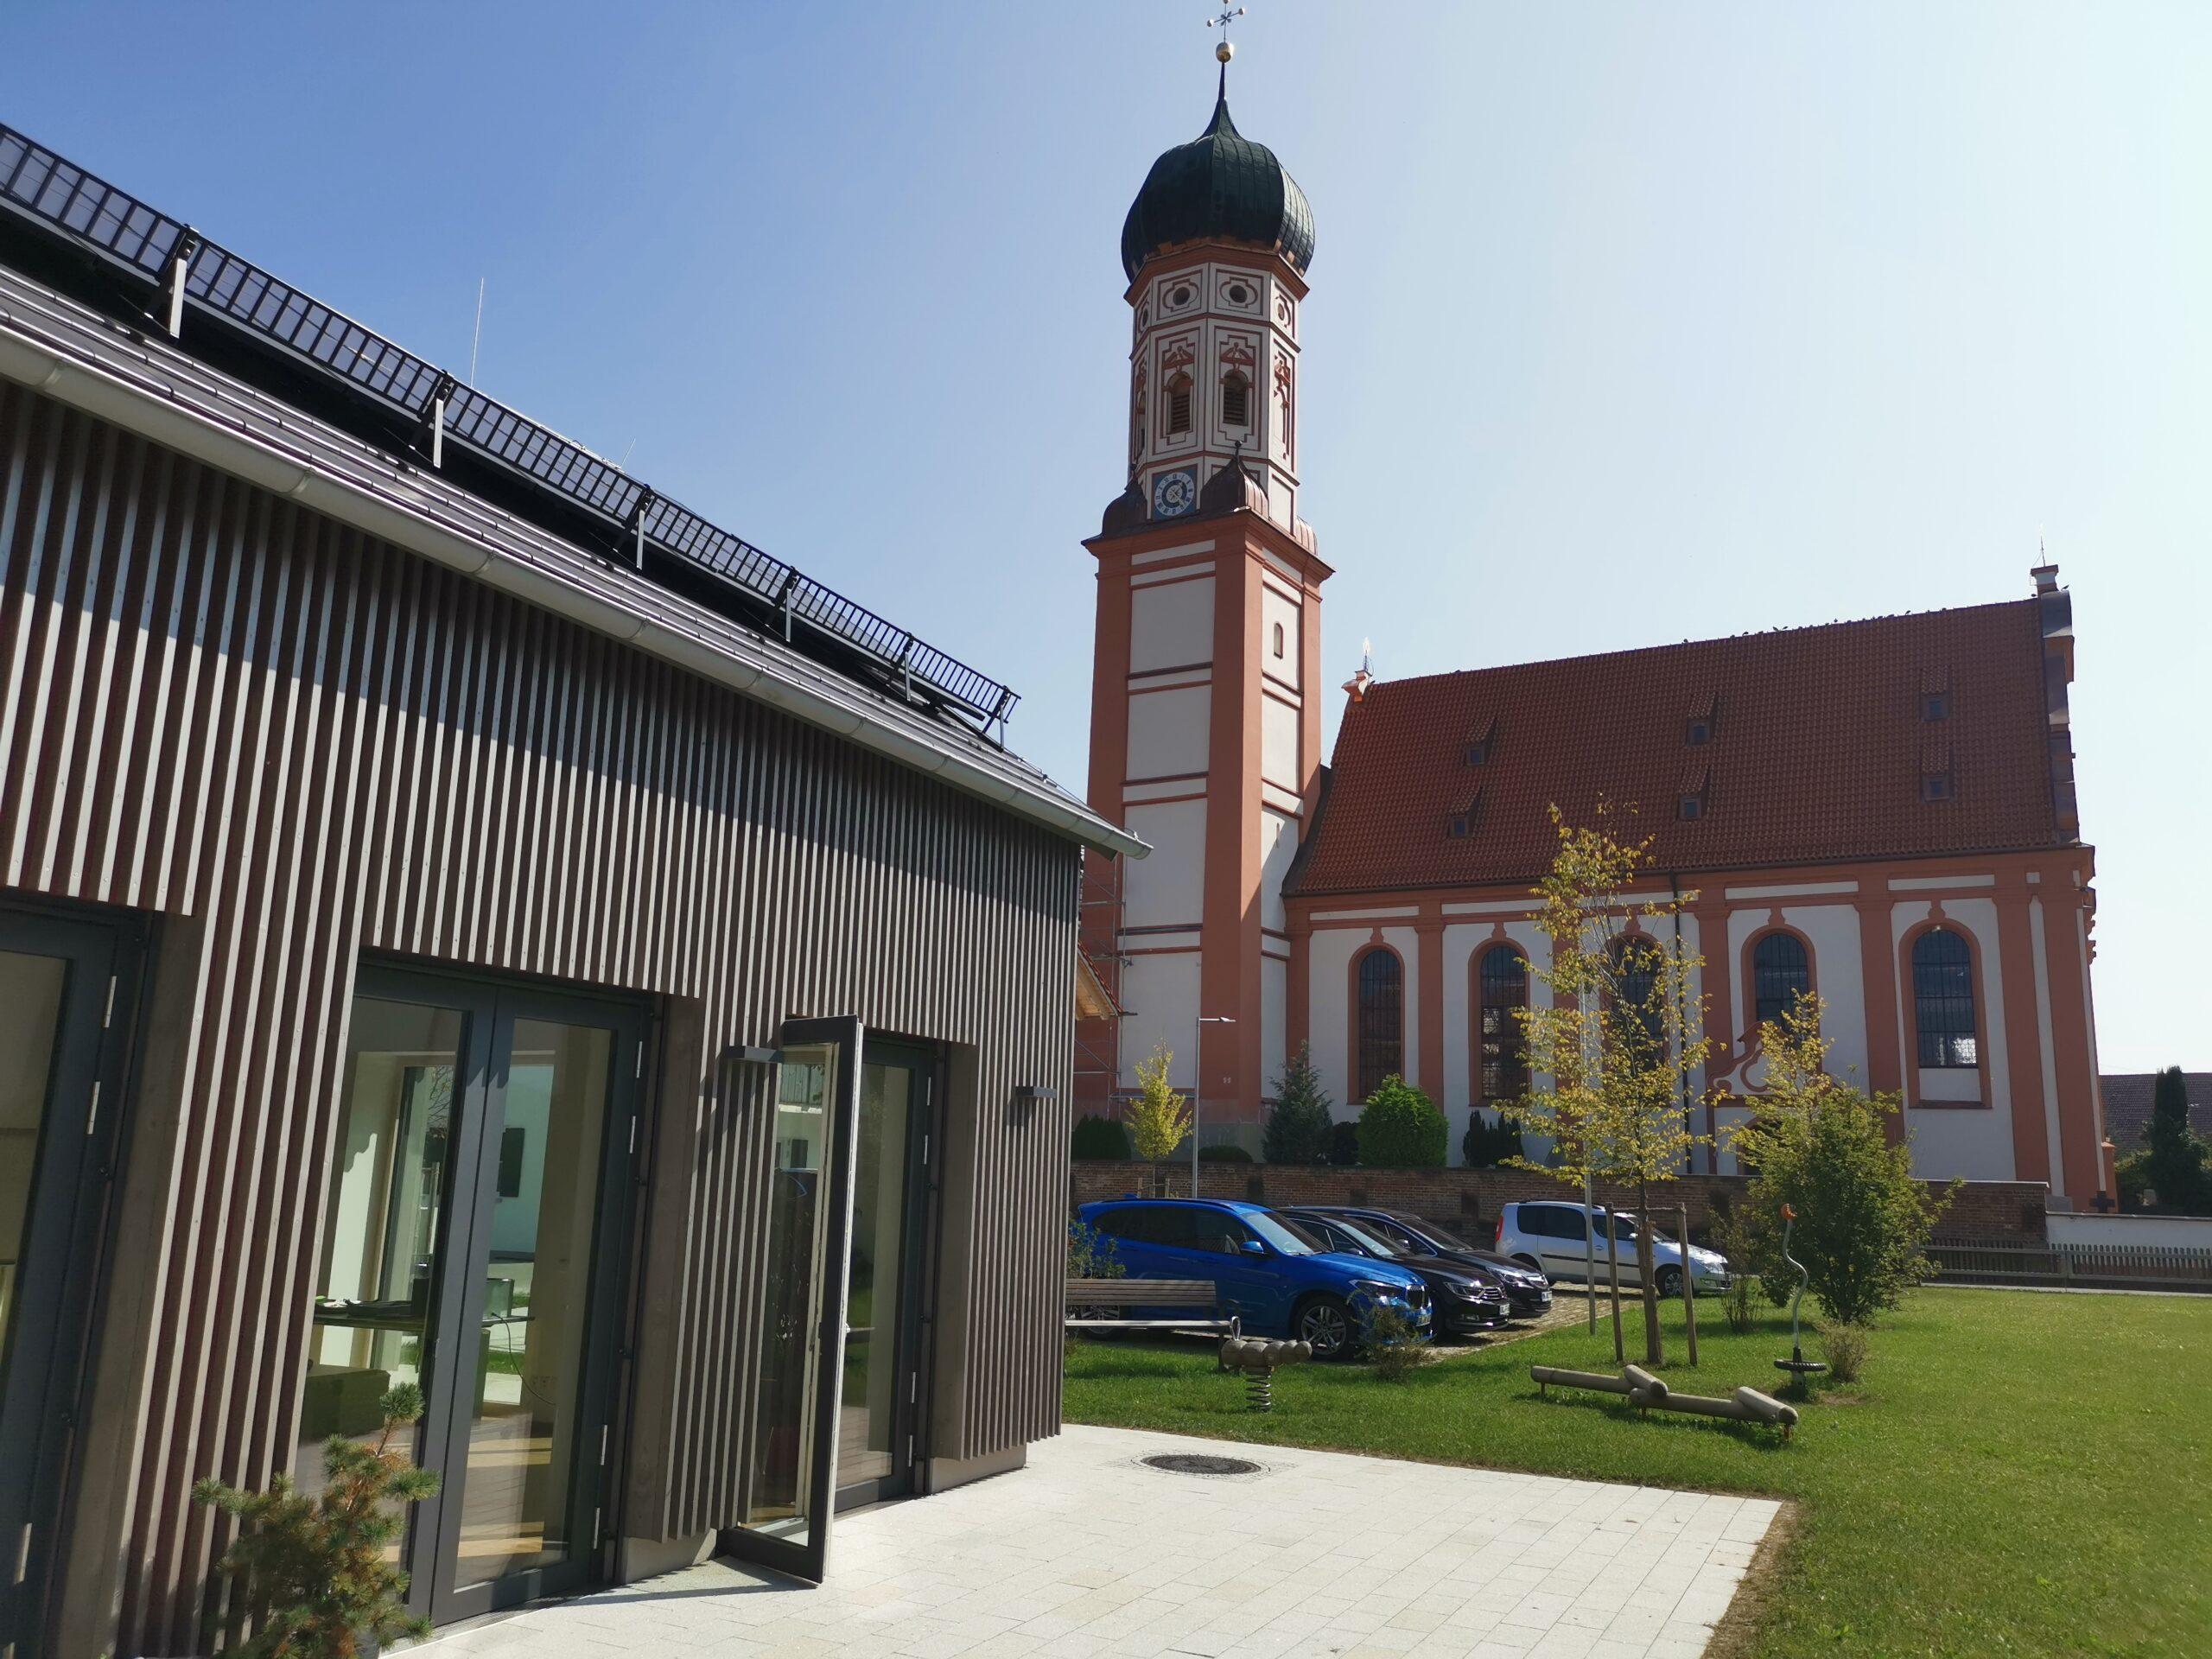 Terrasse Rathaus mit Blick auf Mariä Himmelfahrt